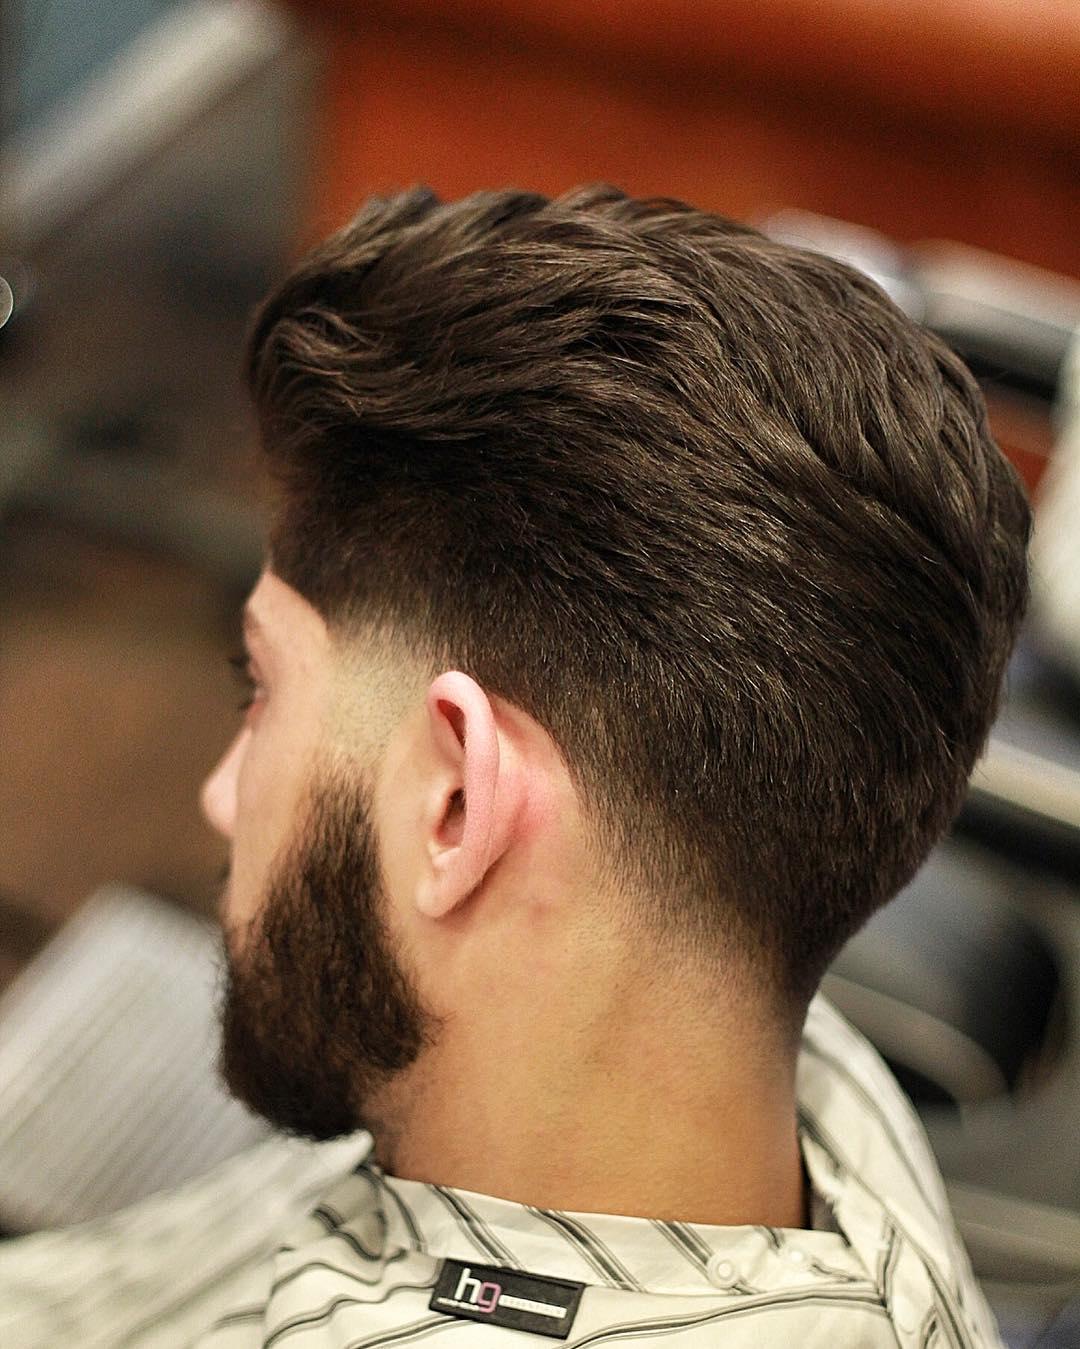 popular men's hairstyles (updated 2018)